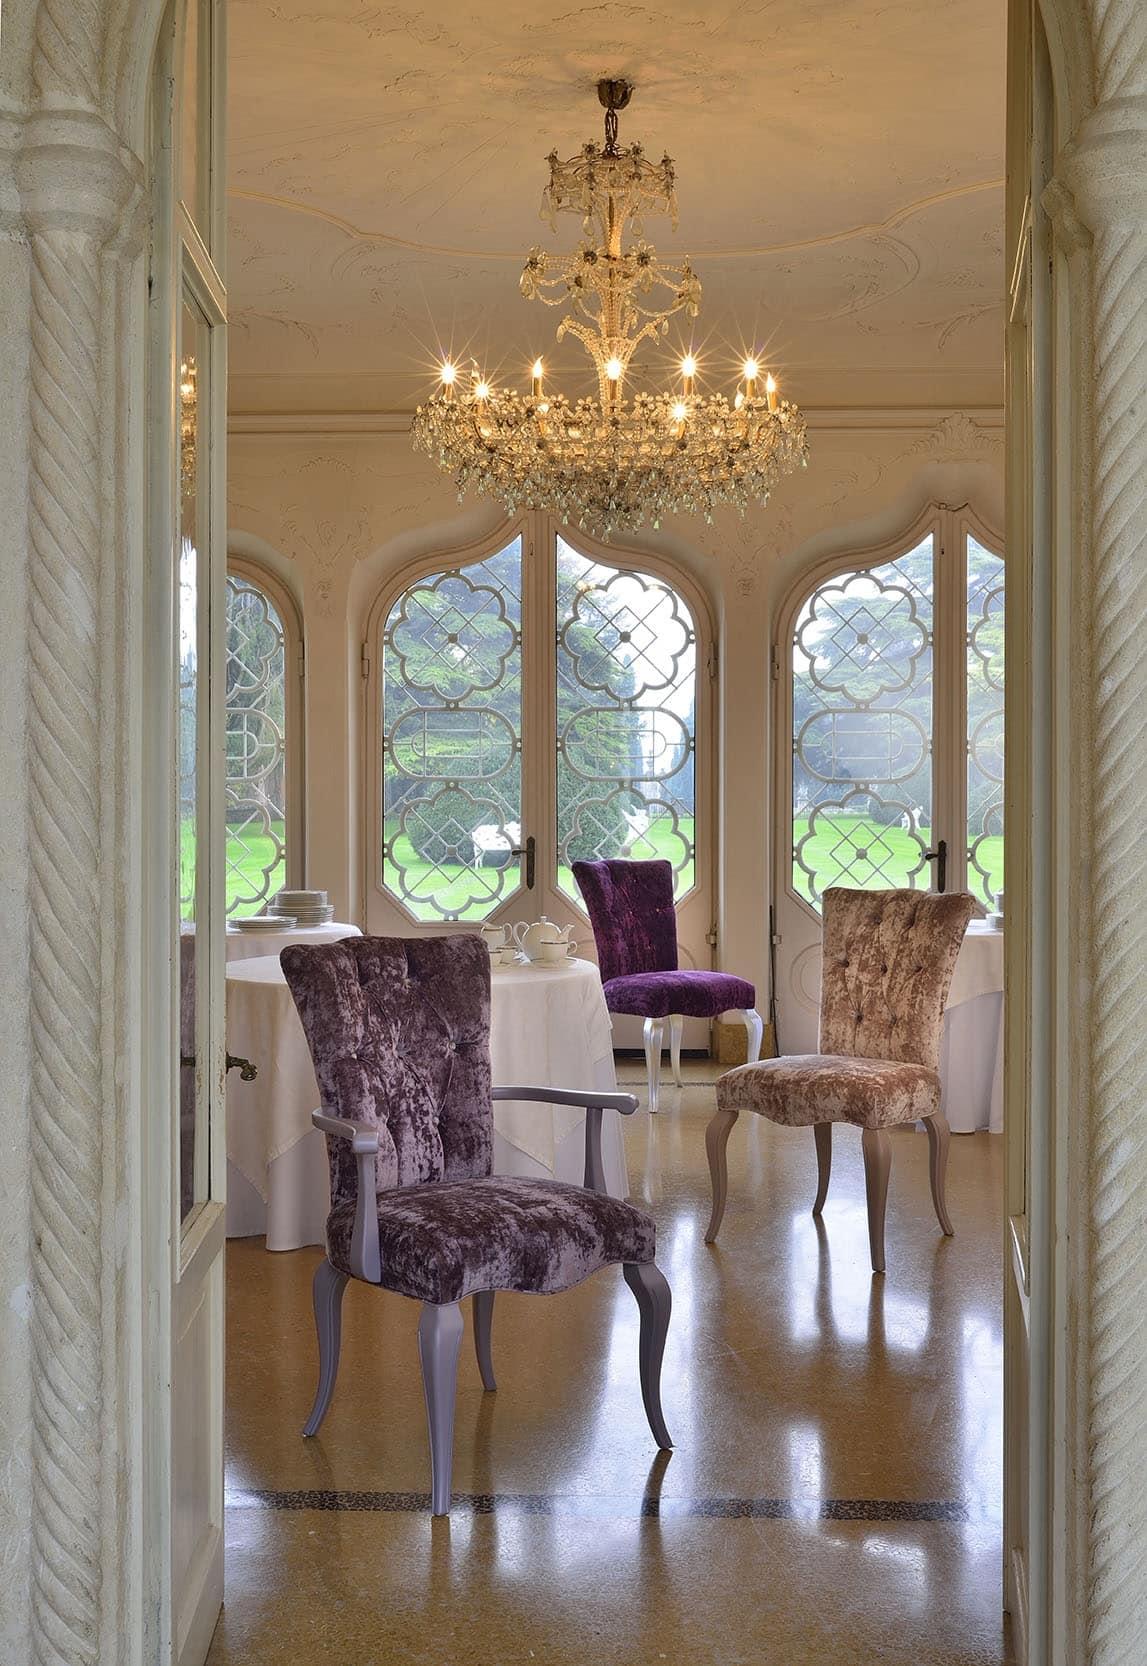 ROYAL sedia 8494S, Sedia classica in faggio, imbottita, customizzabile